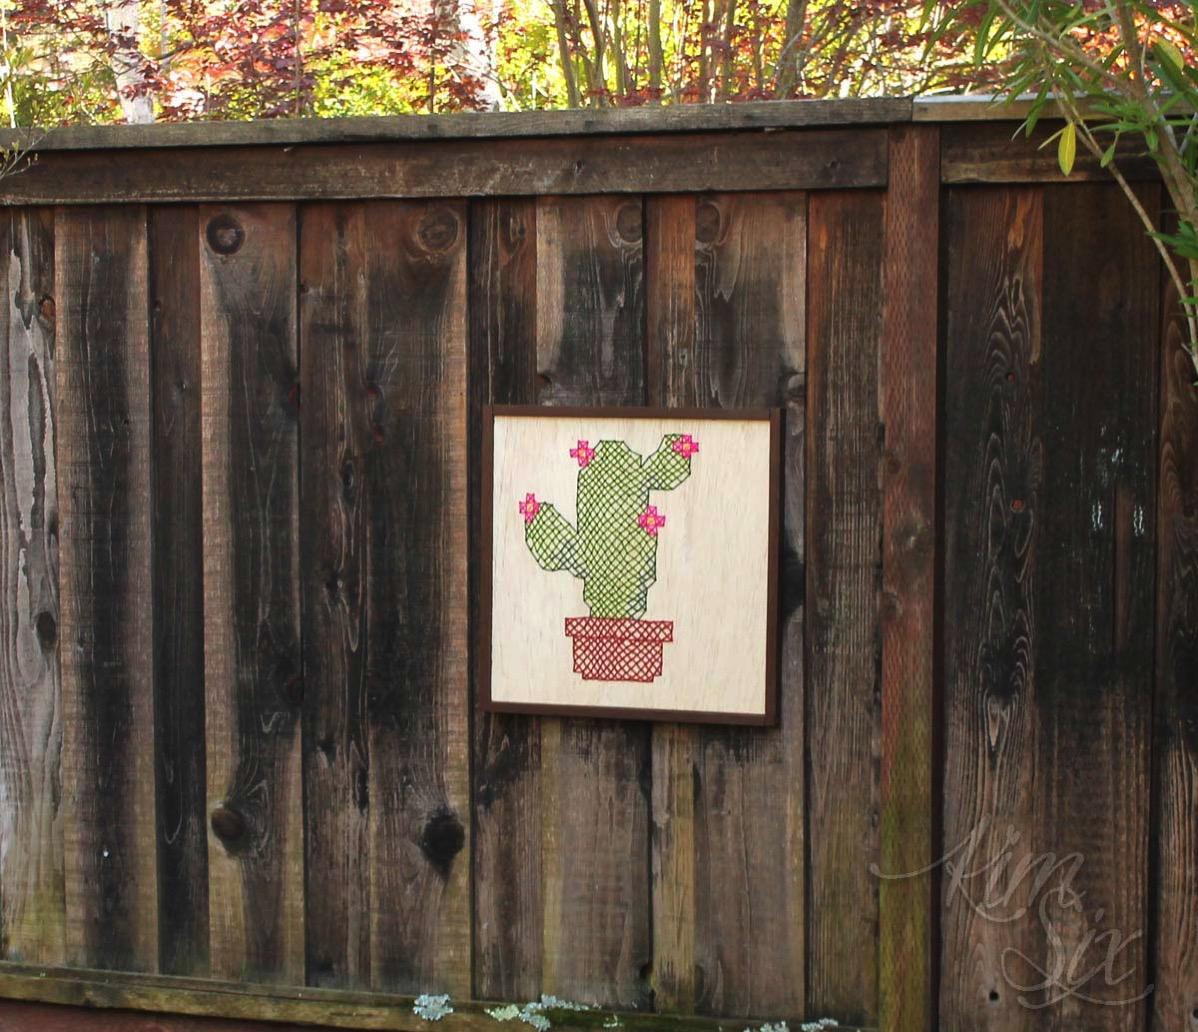 Oversized cross stitch on wood